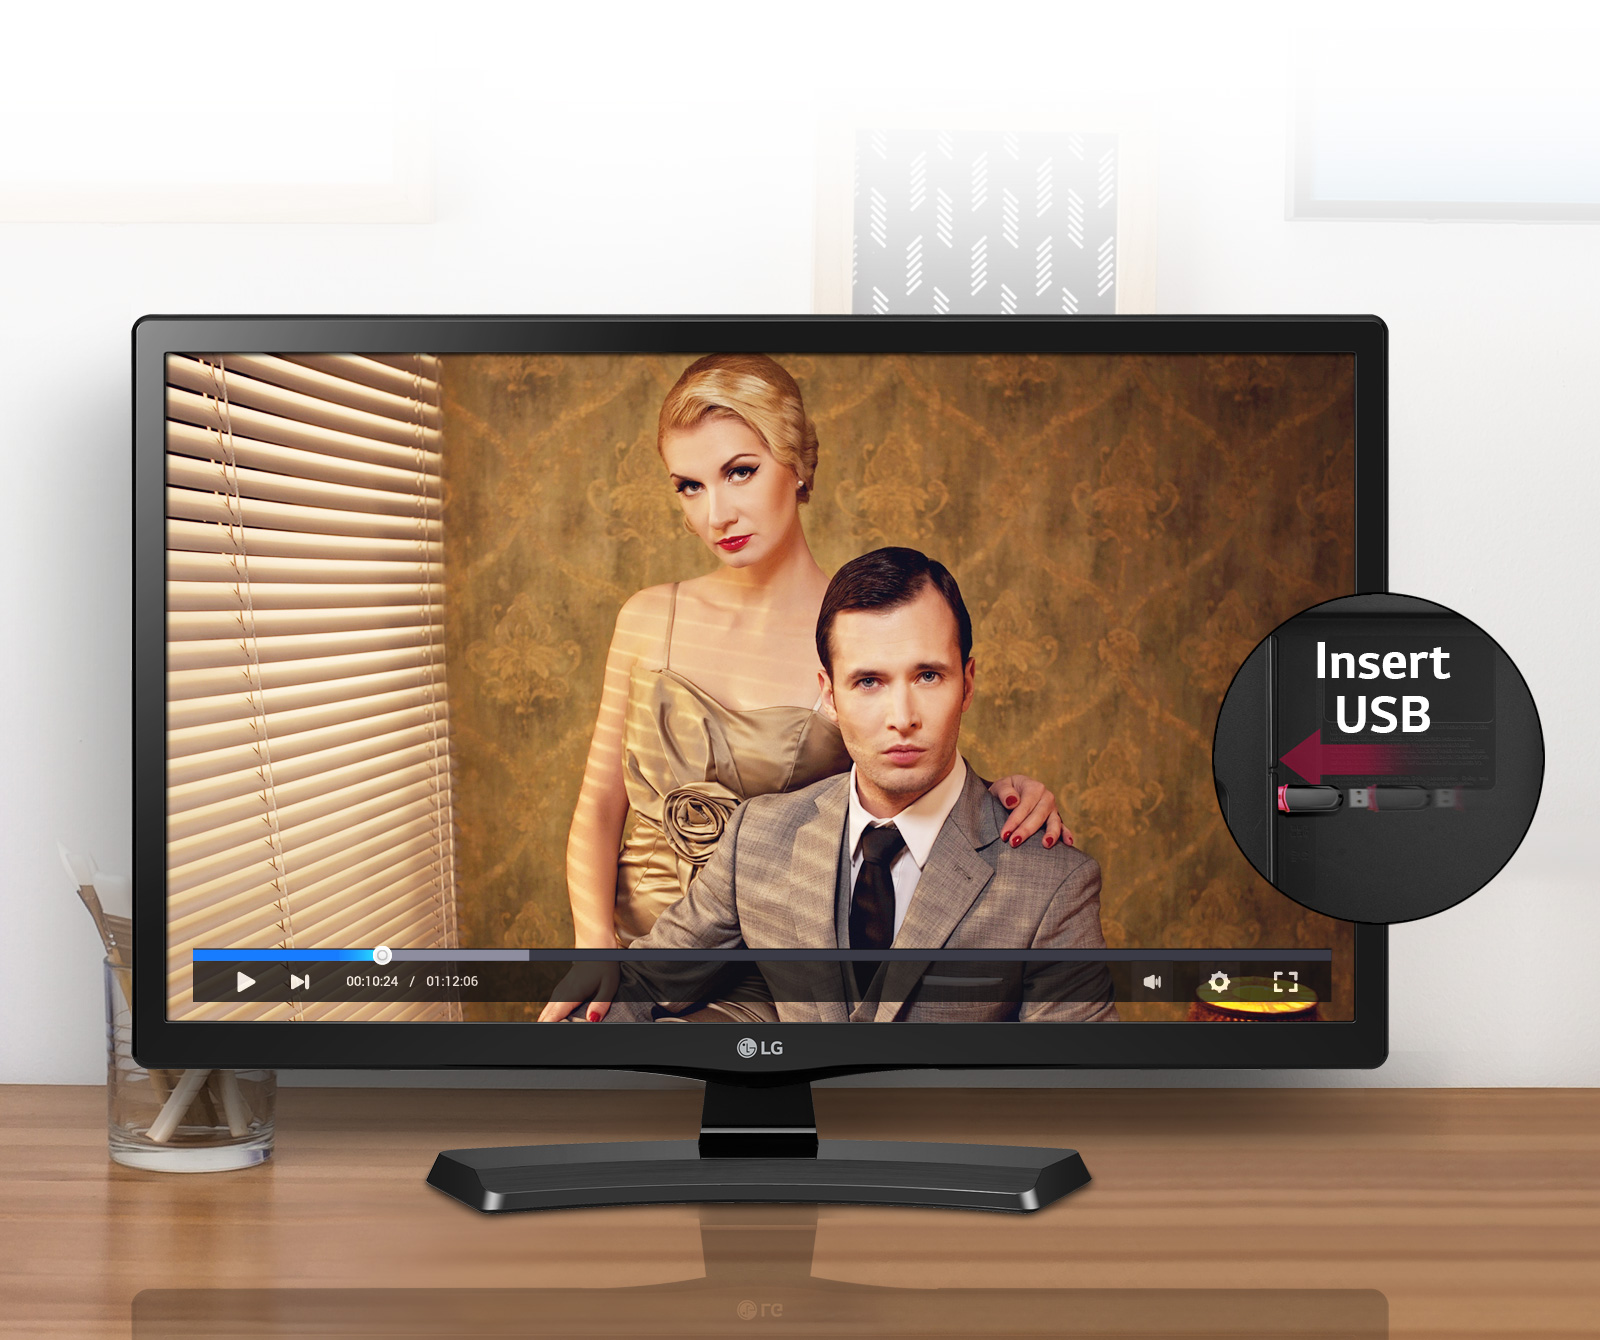 تلویزیون ال جی 28 اینچmt48vf